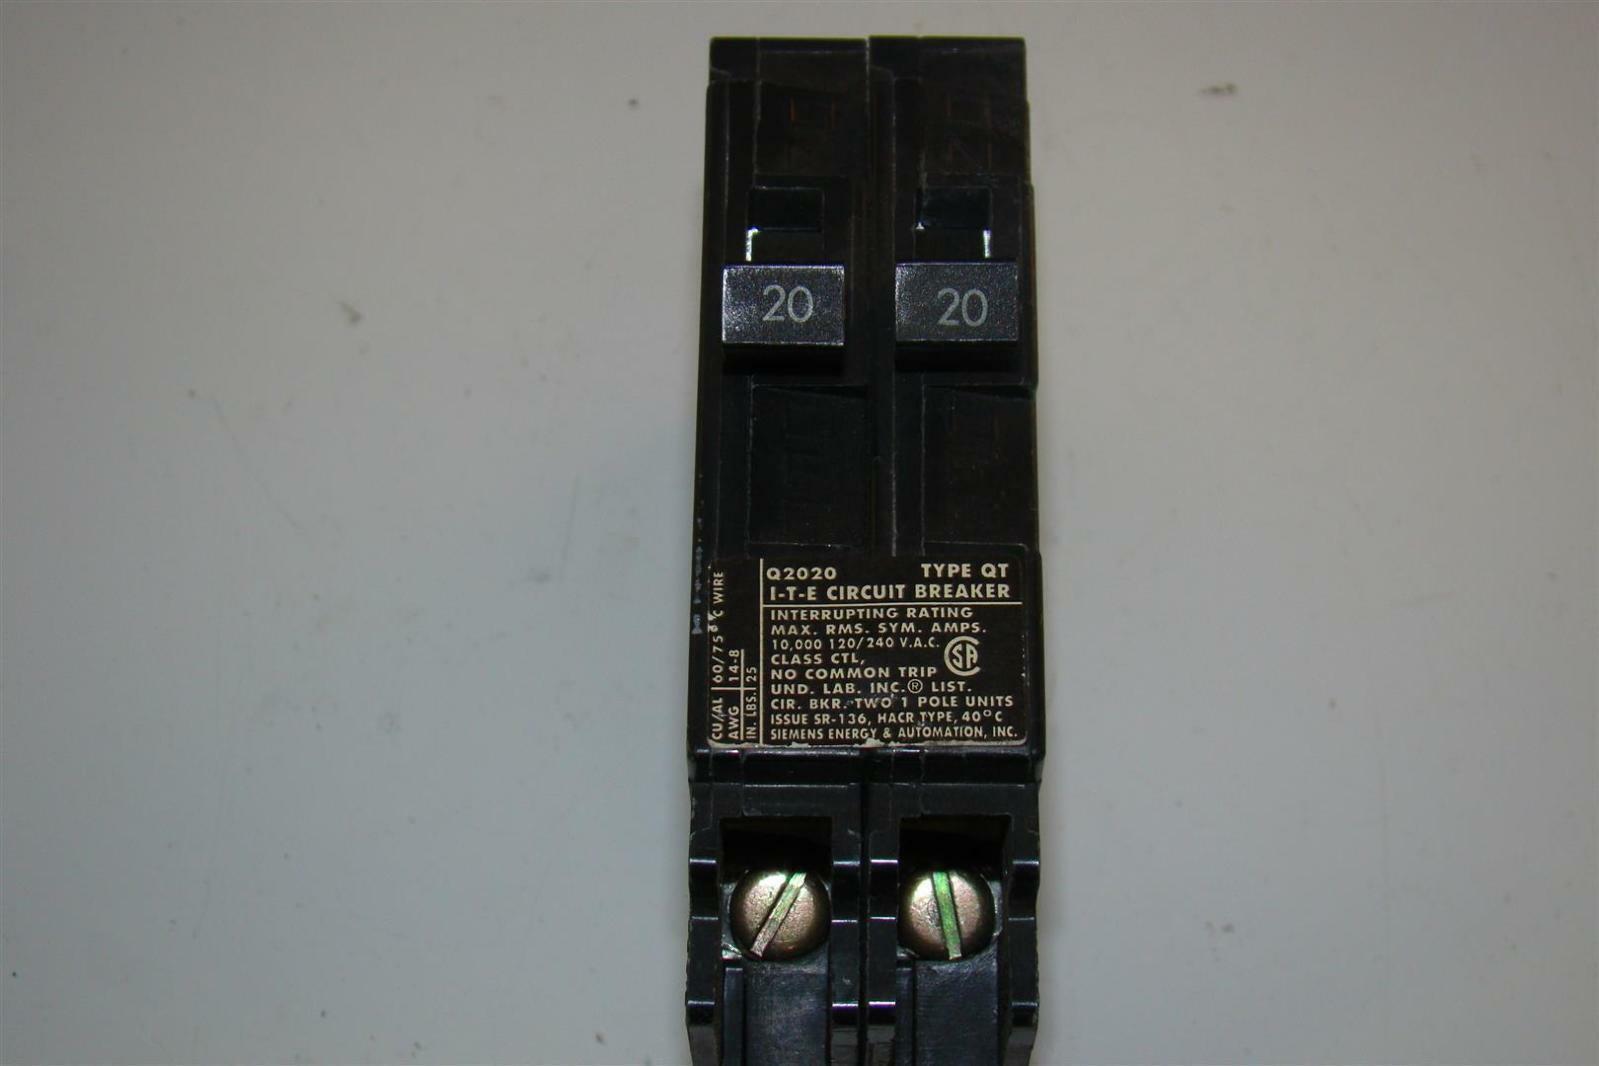 Siemens 2 20 Amp Tandem Single Pole Type QT NCL-Circuit Breaker